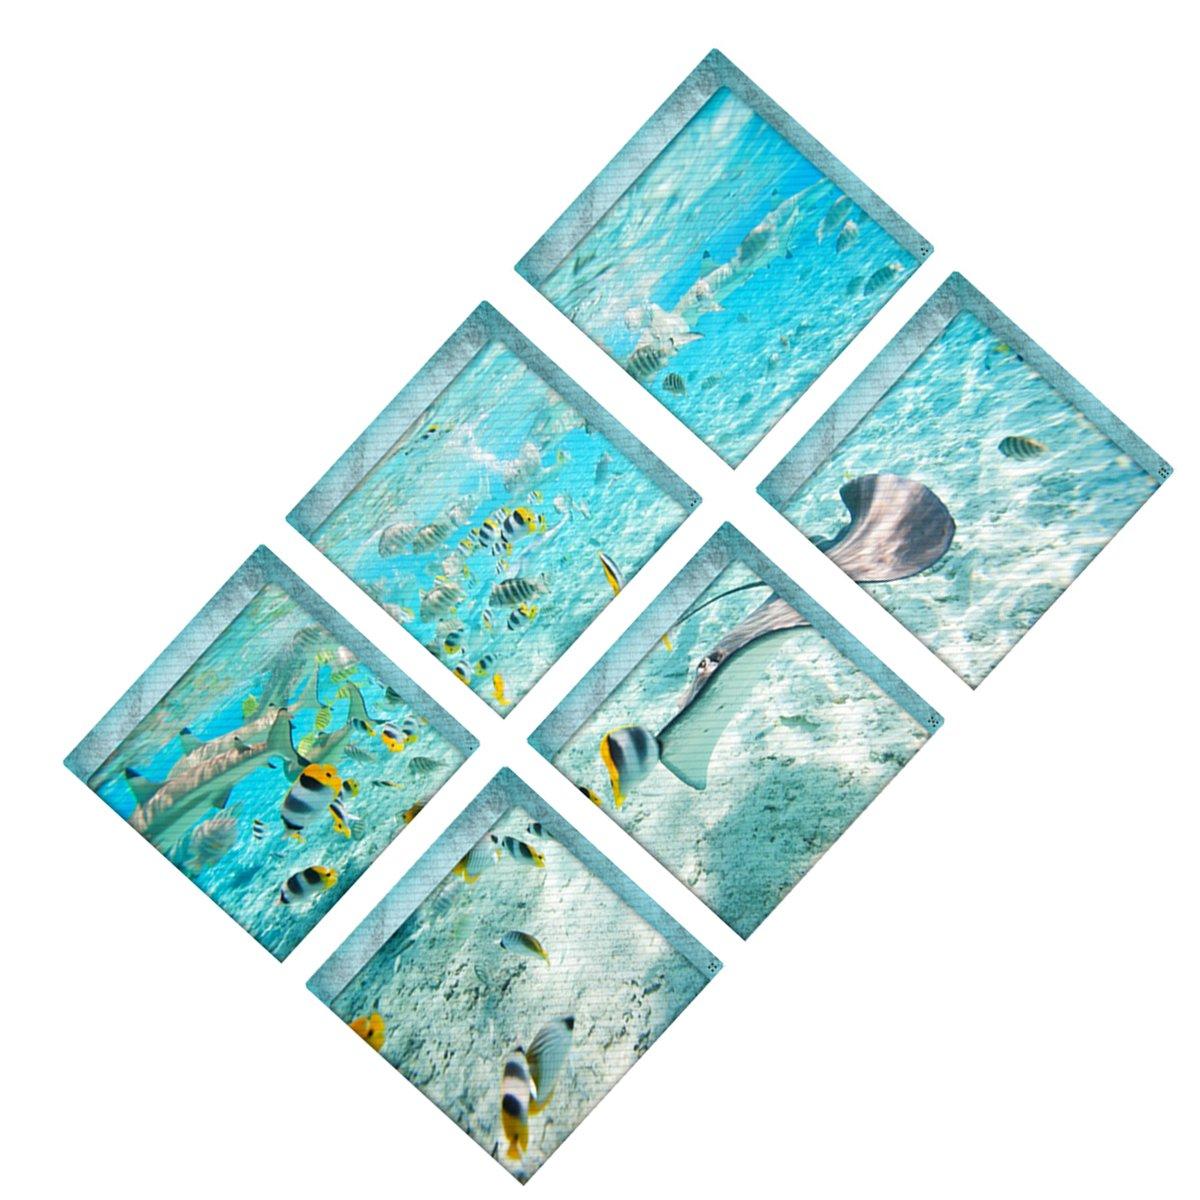 OUNONA Adesivi da bagno antiscivolo da 6 pezzi Adesivi da bagno per il mondo subacqueo Adesivi antiscivolo per la vasca da bagno Adesivi per vasca da bagno